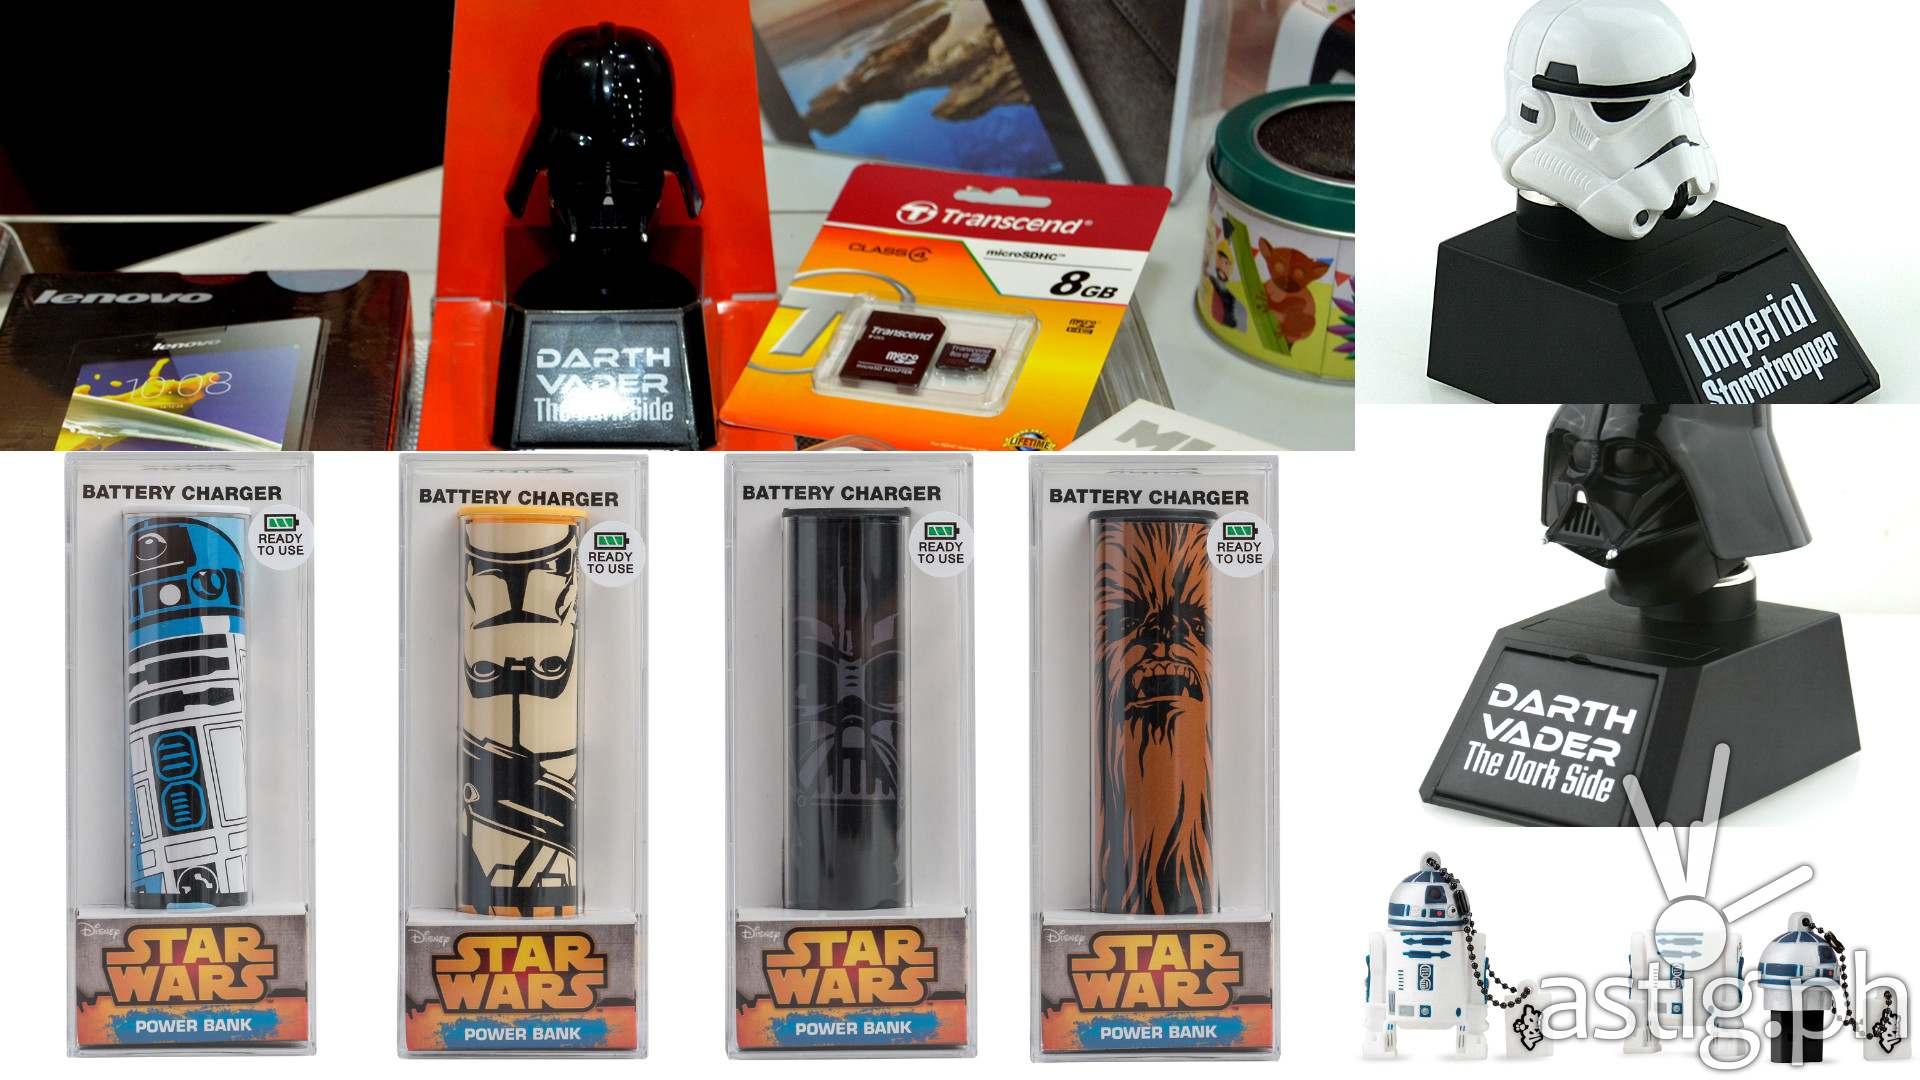 star wars accessories from allphones philippines